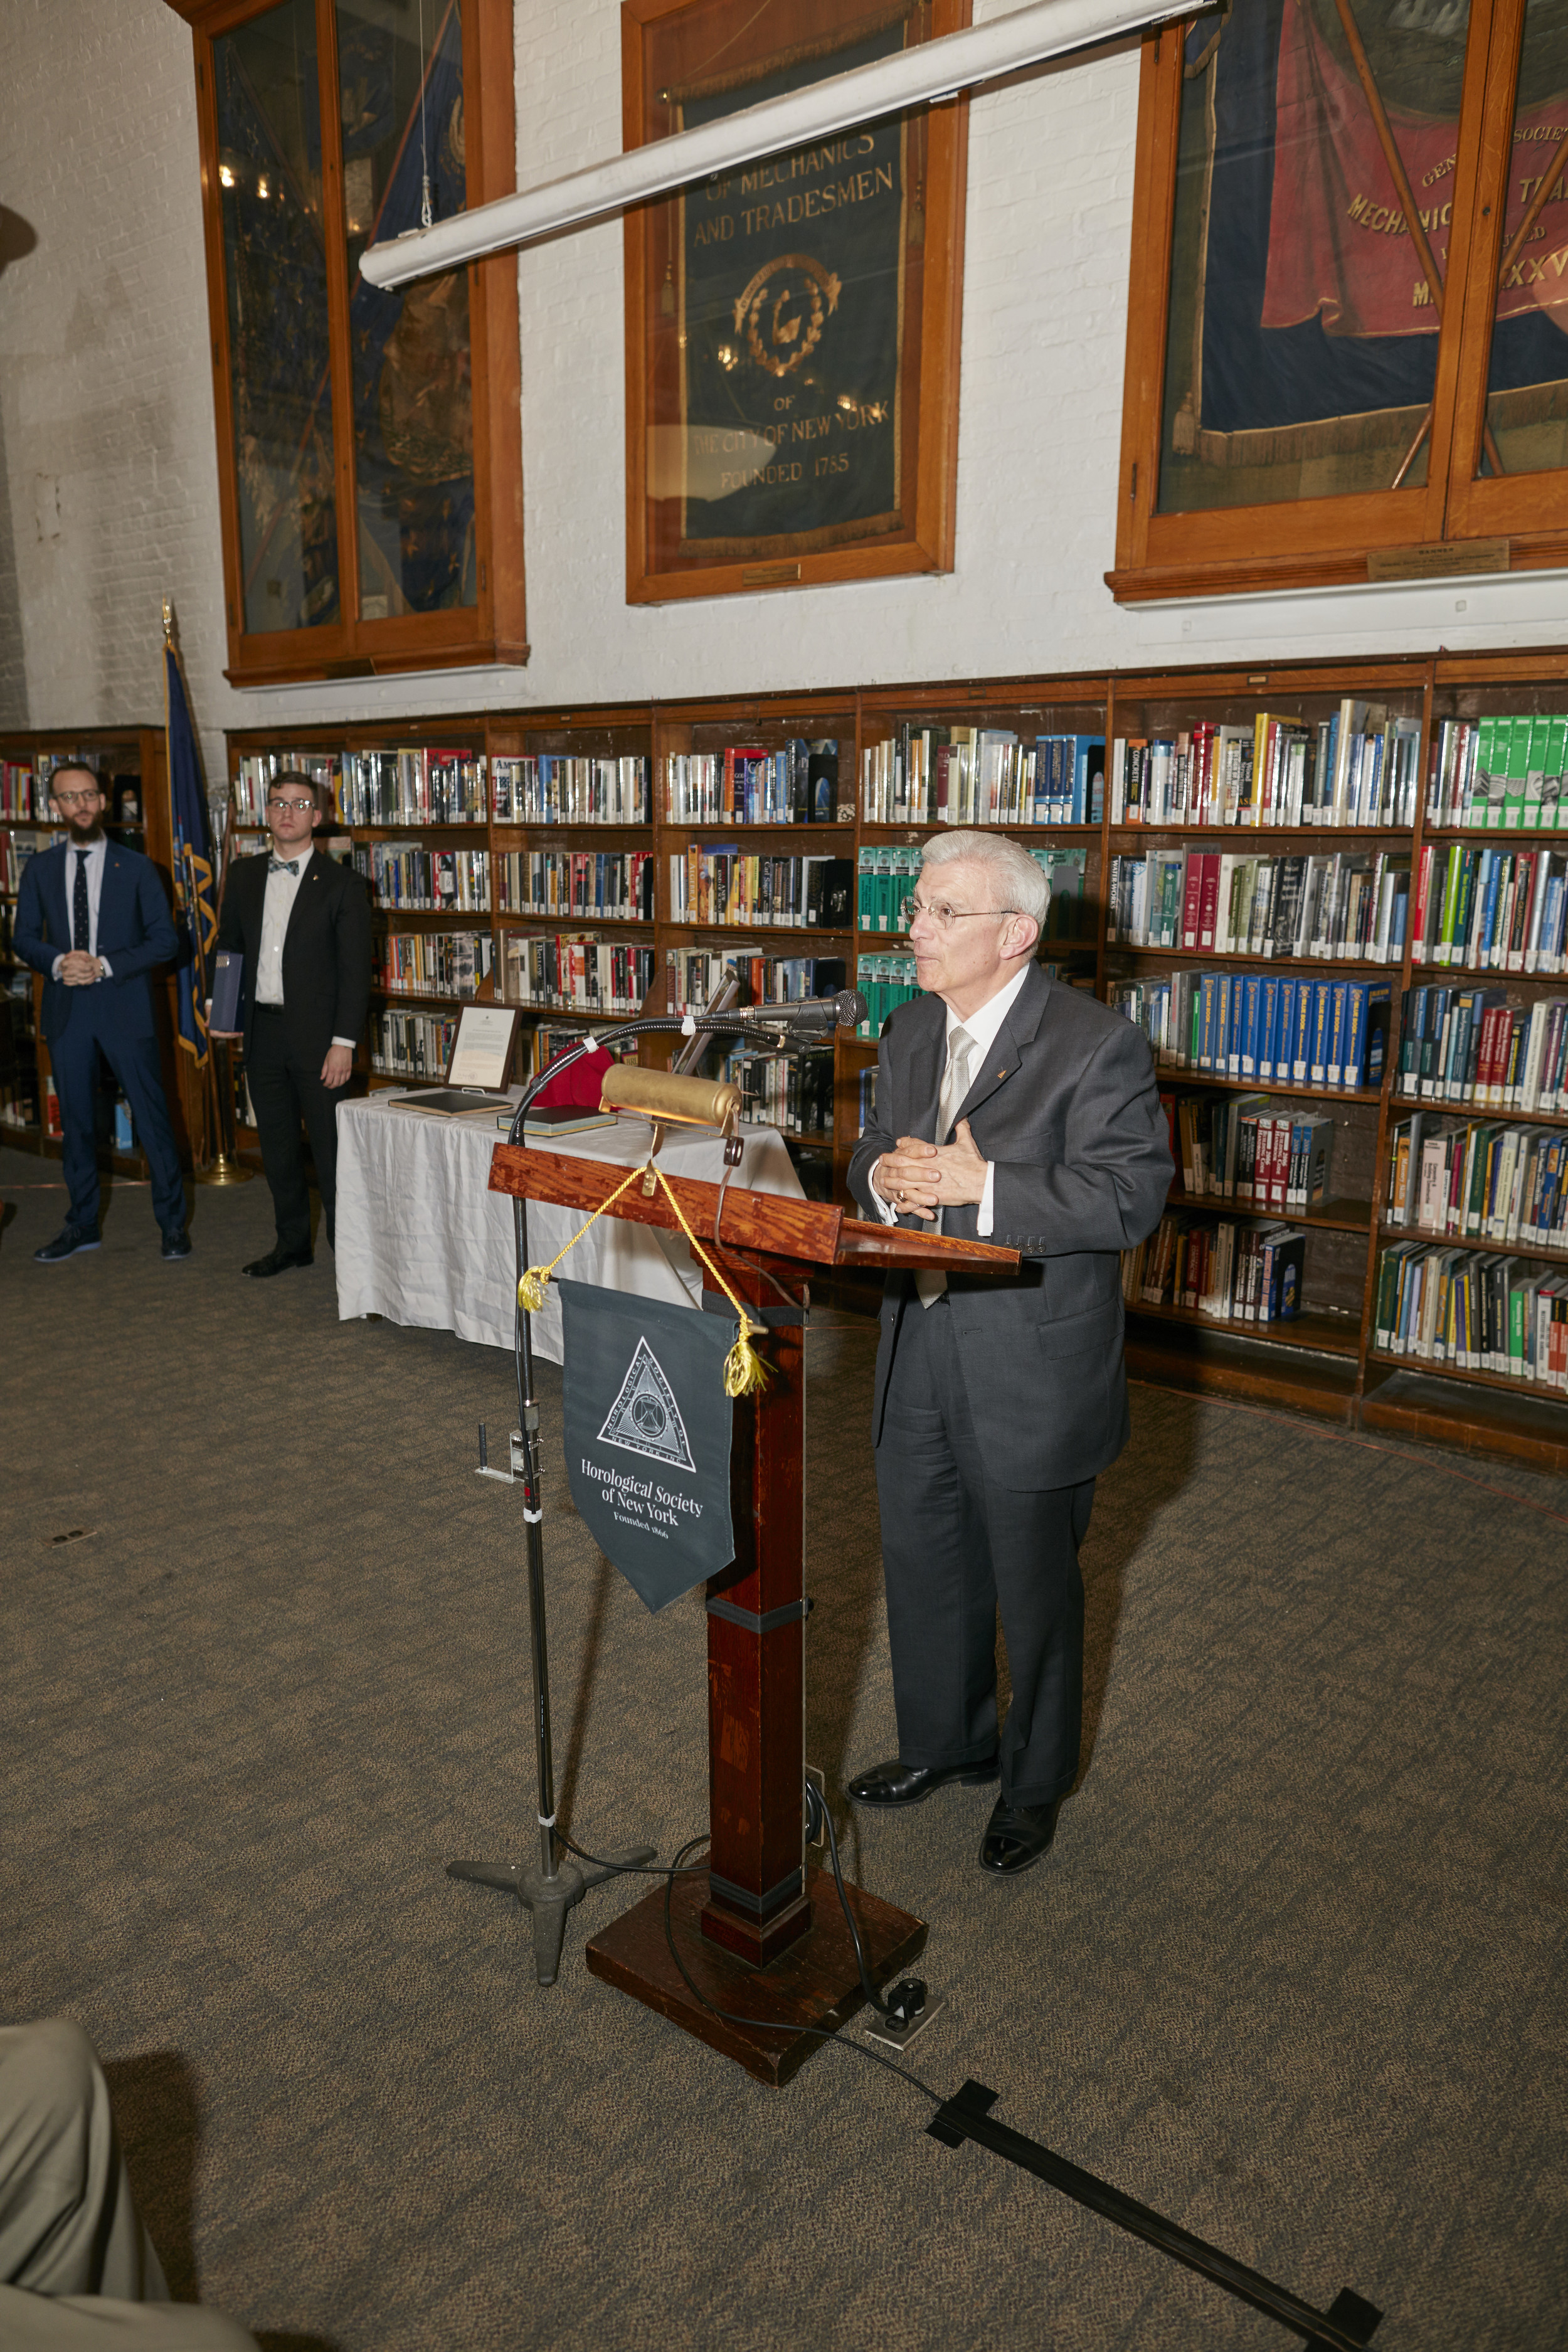 Charles Salomon, HSNY Treasurer & Fellow, speaking to the crowd